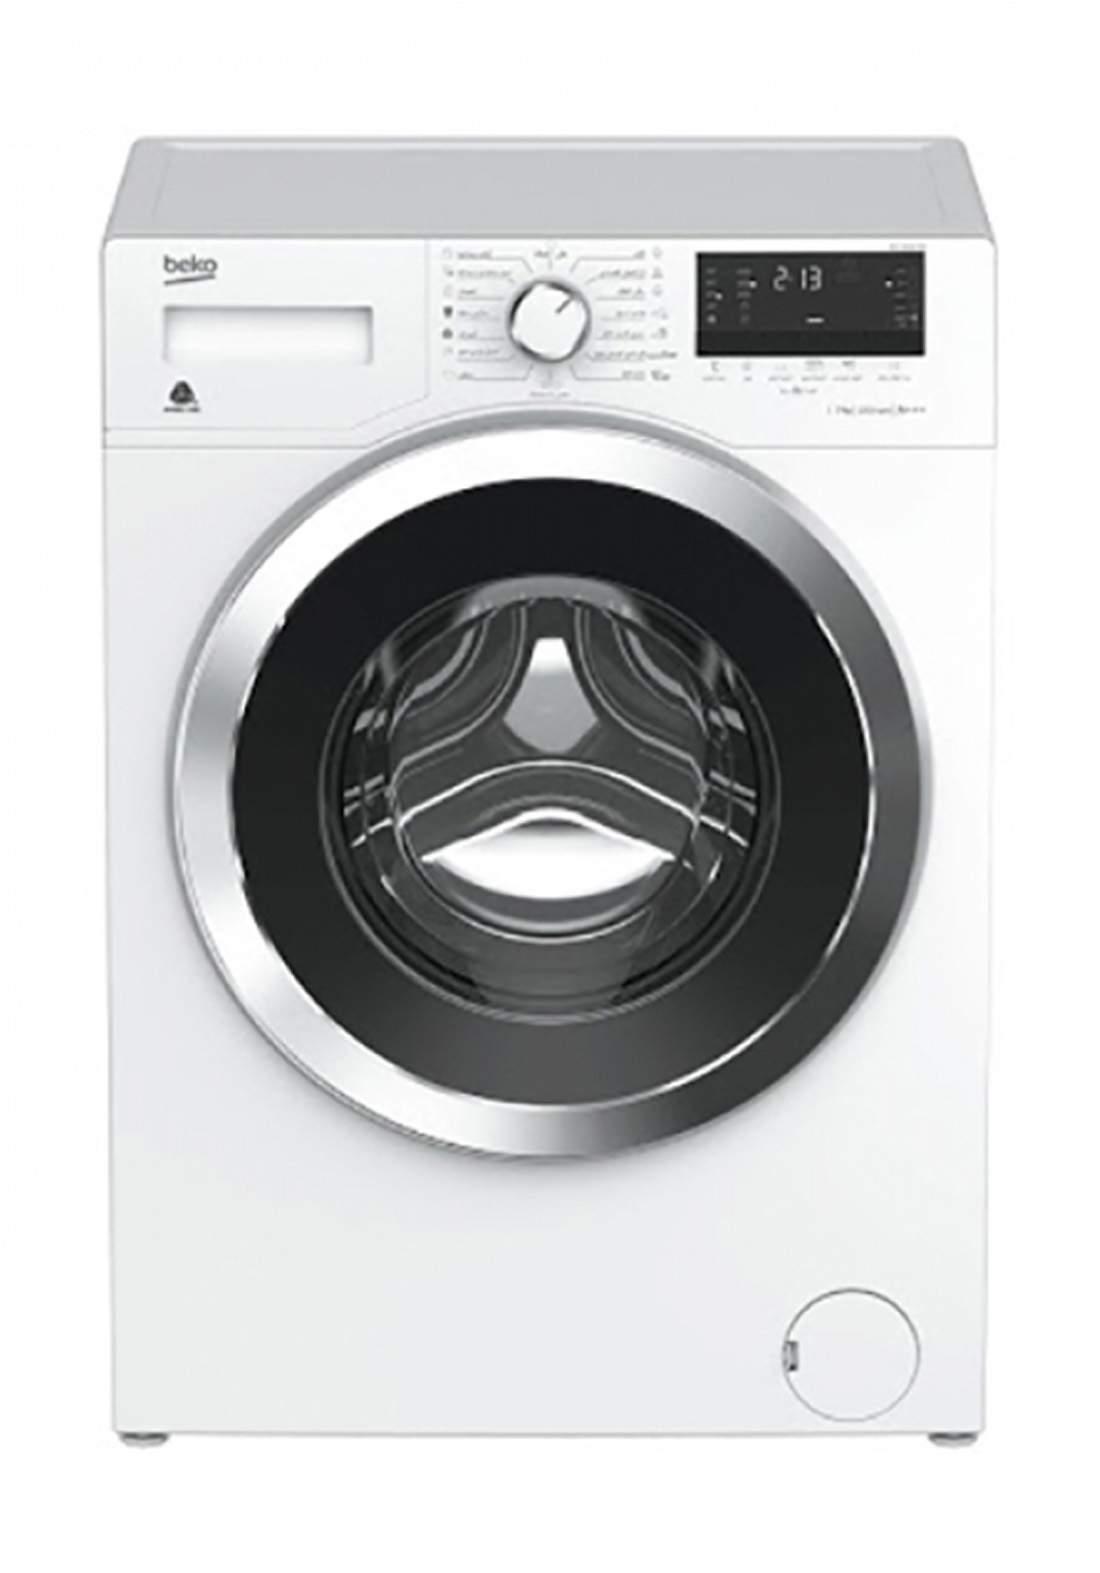 Beko WCC 7632XW 1200RPM Front Loading Washing Machine 2Kg - White